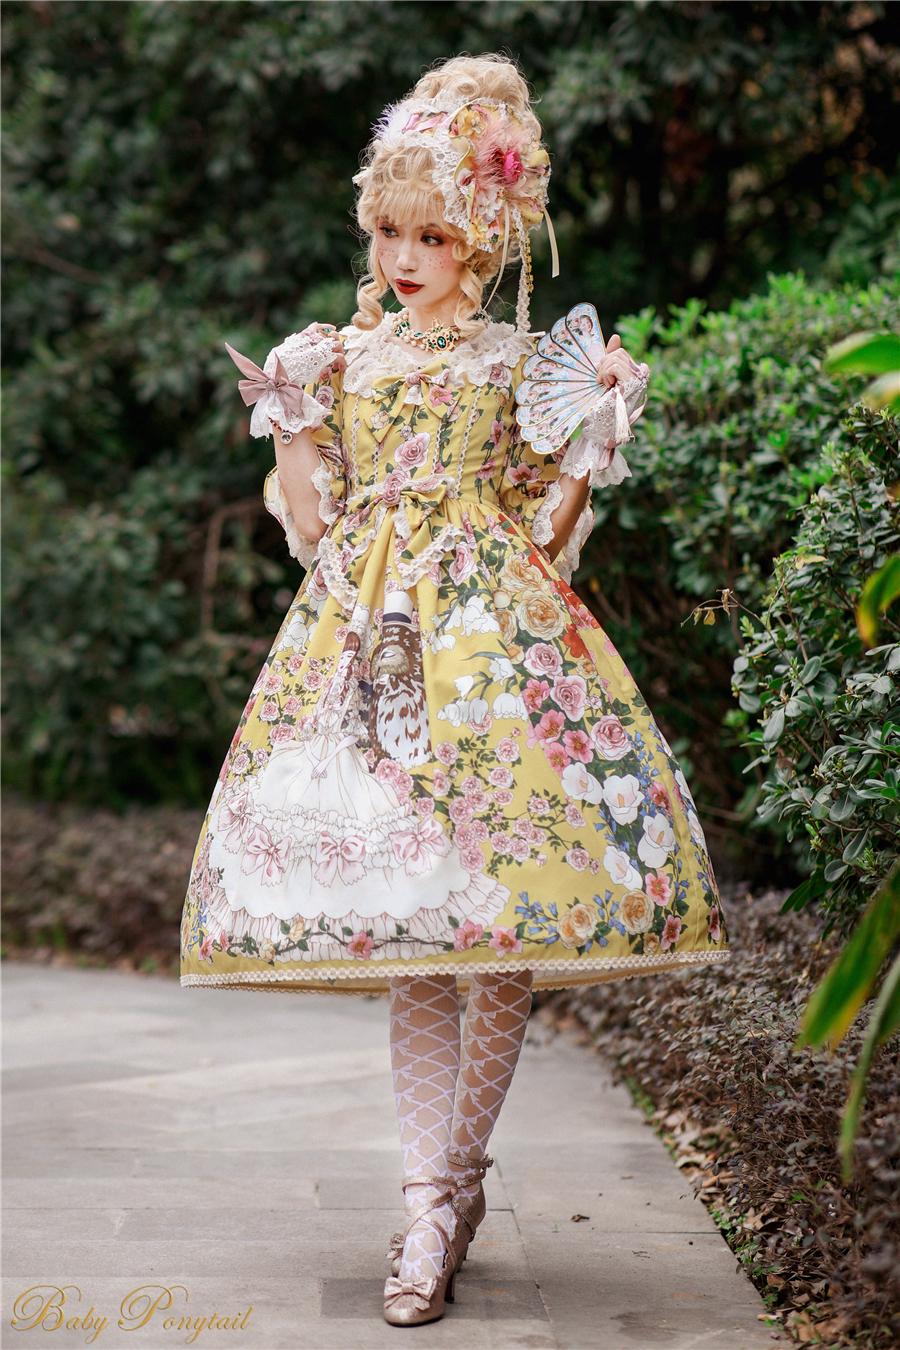 Baby Ponytail_Model Photo_Polly's Garden of Dreams_OP Yellow_Kaka_19.jpg